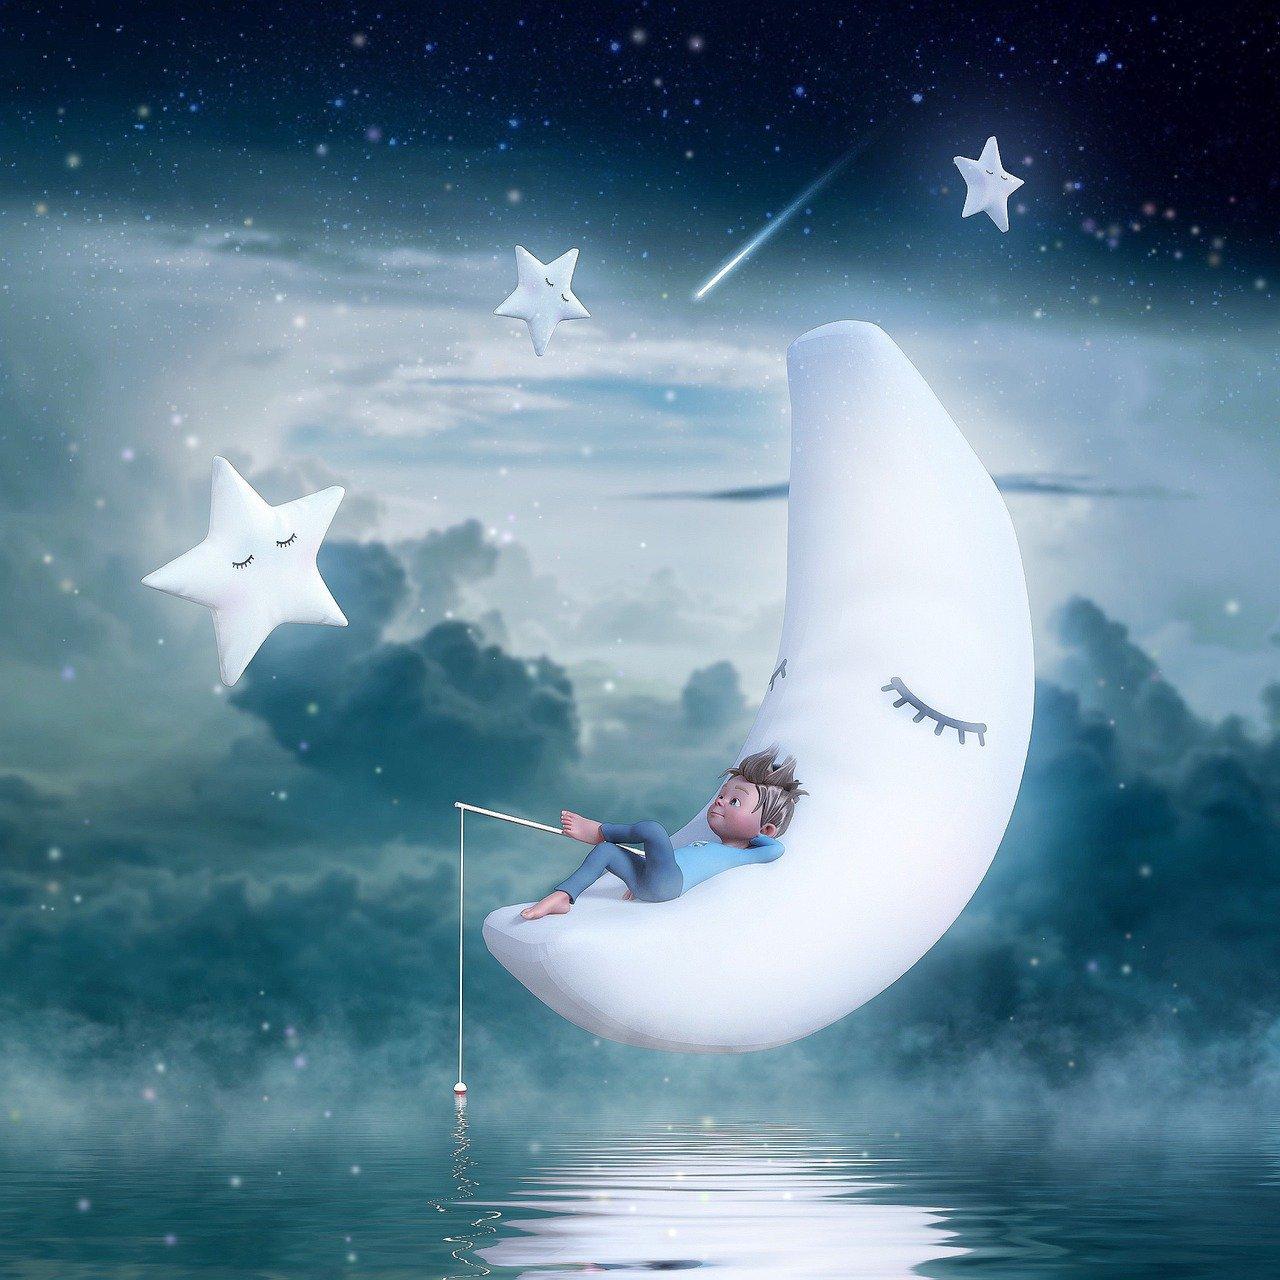 moon, star, boy-4450739.jpg